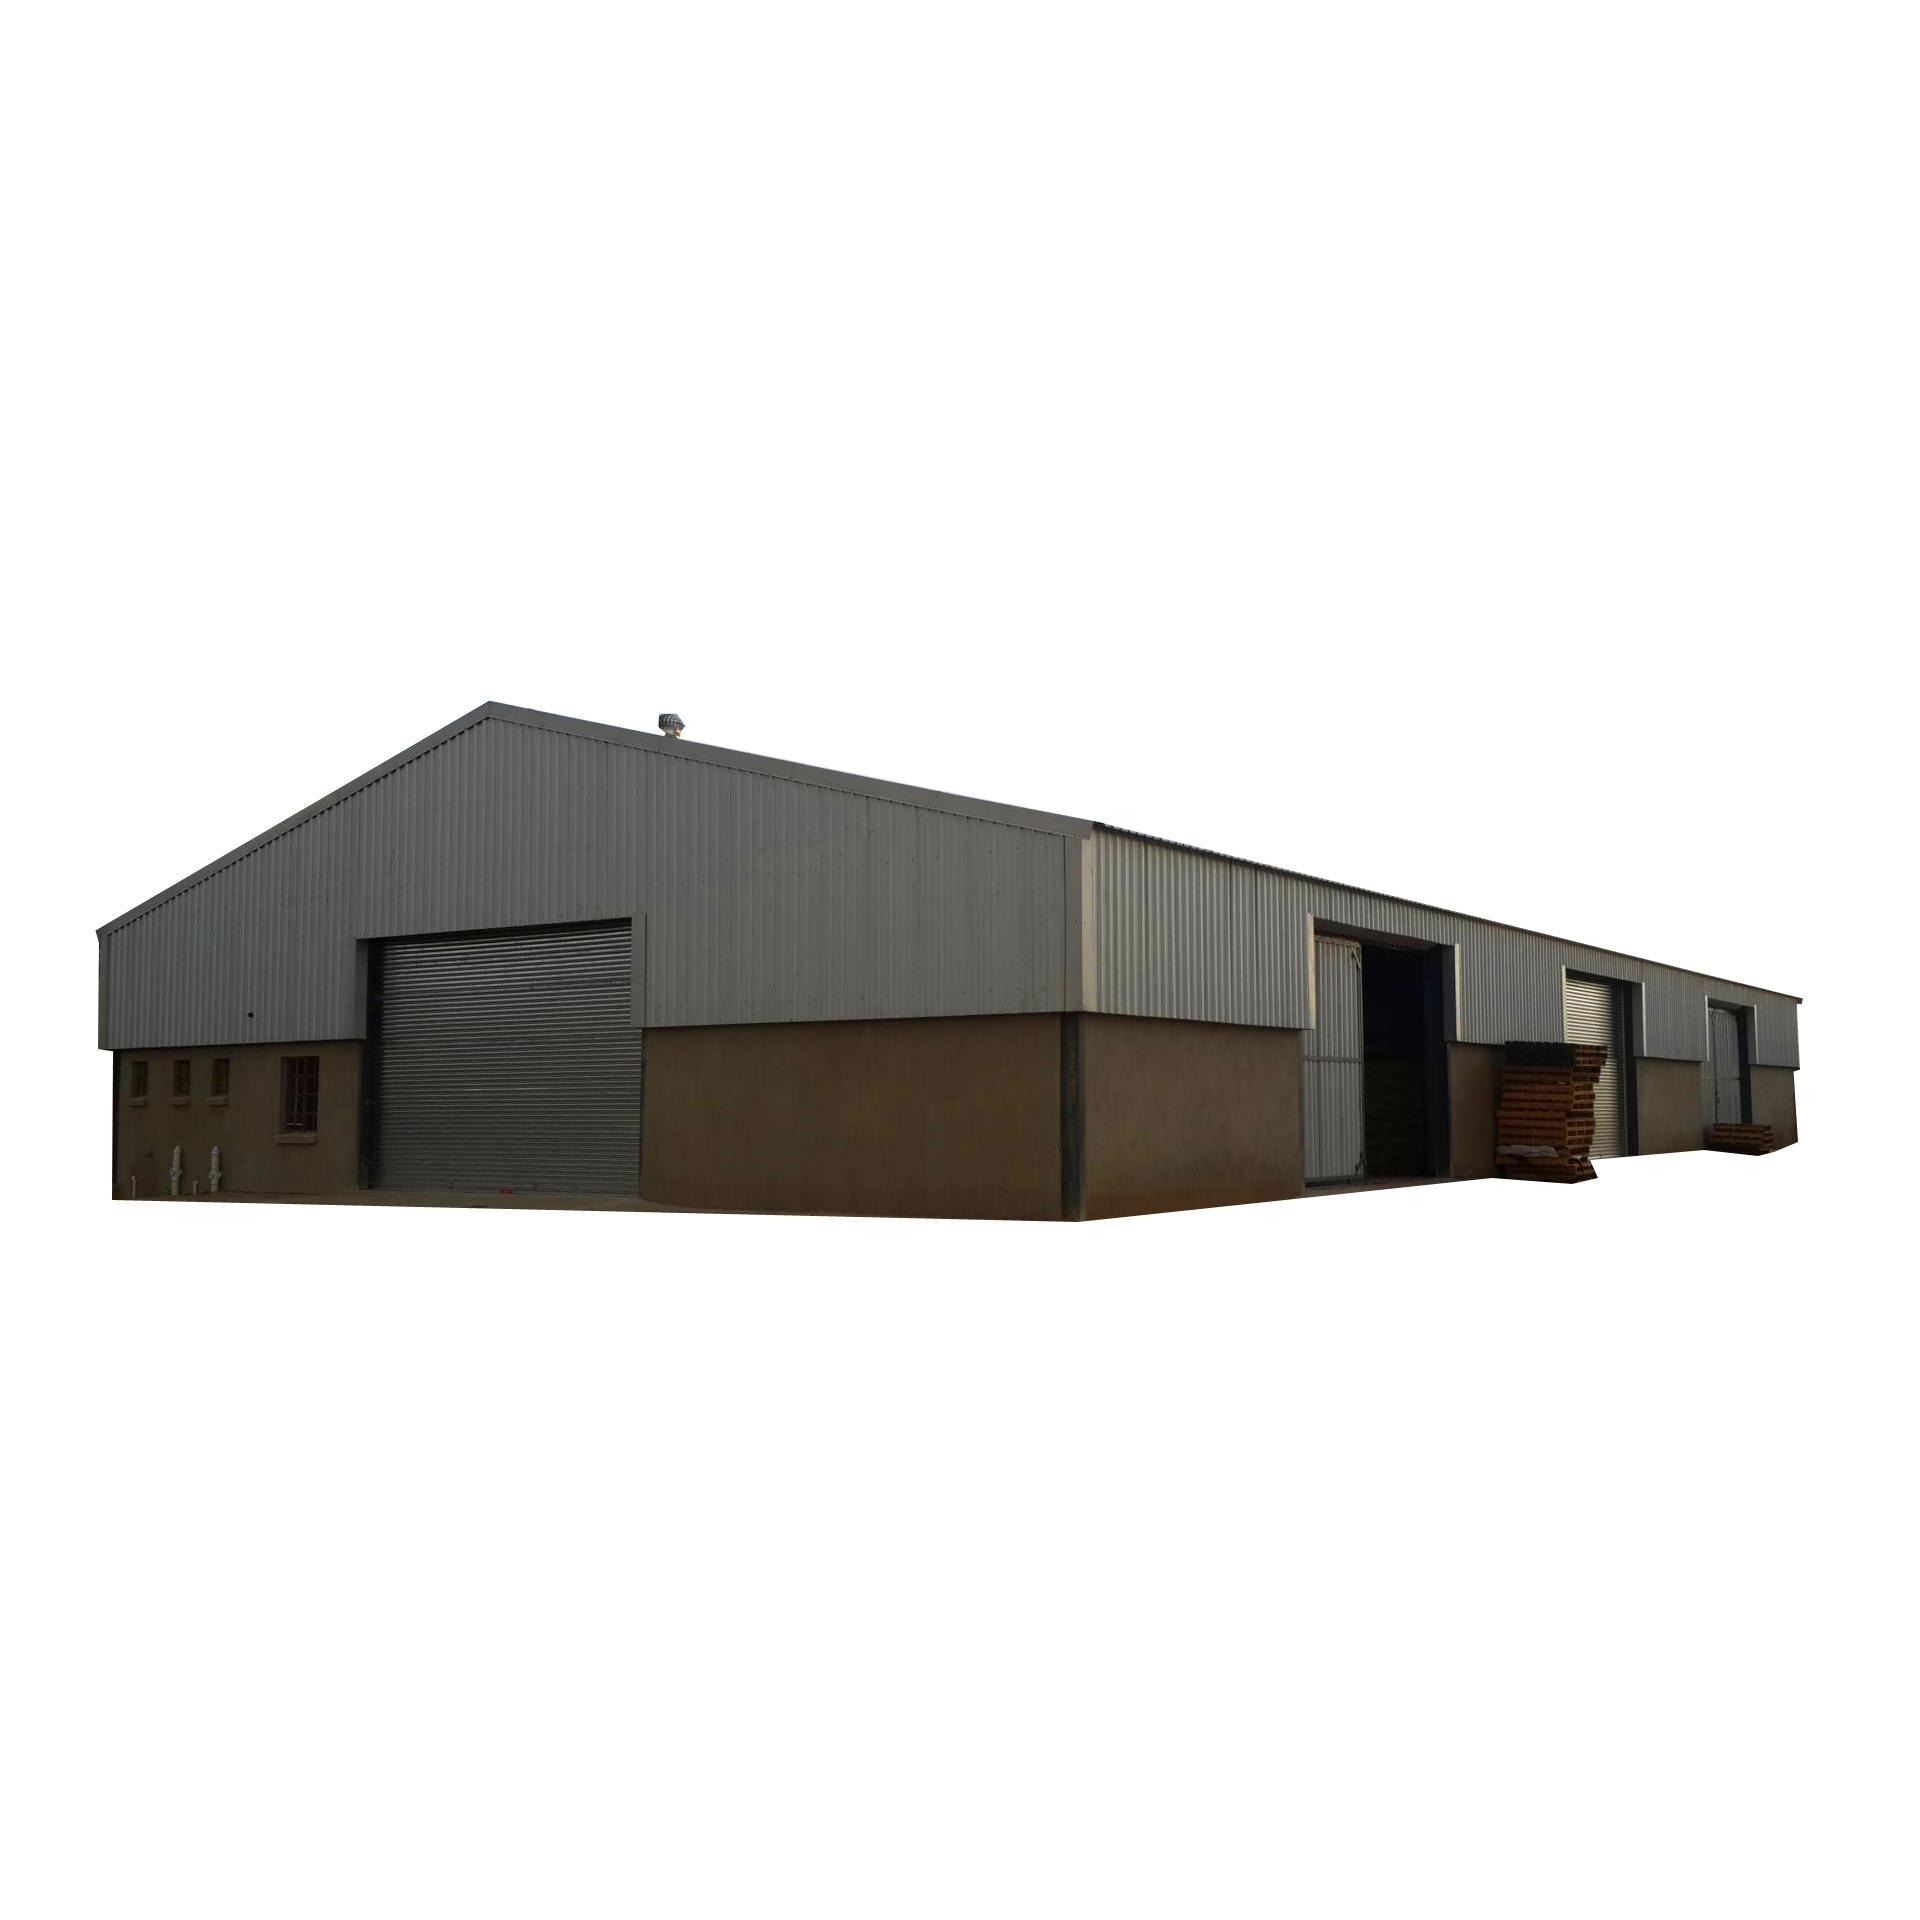 Дешевые цены на склад сборная стальная конструкция склад